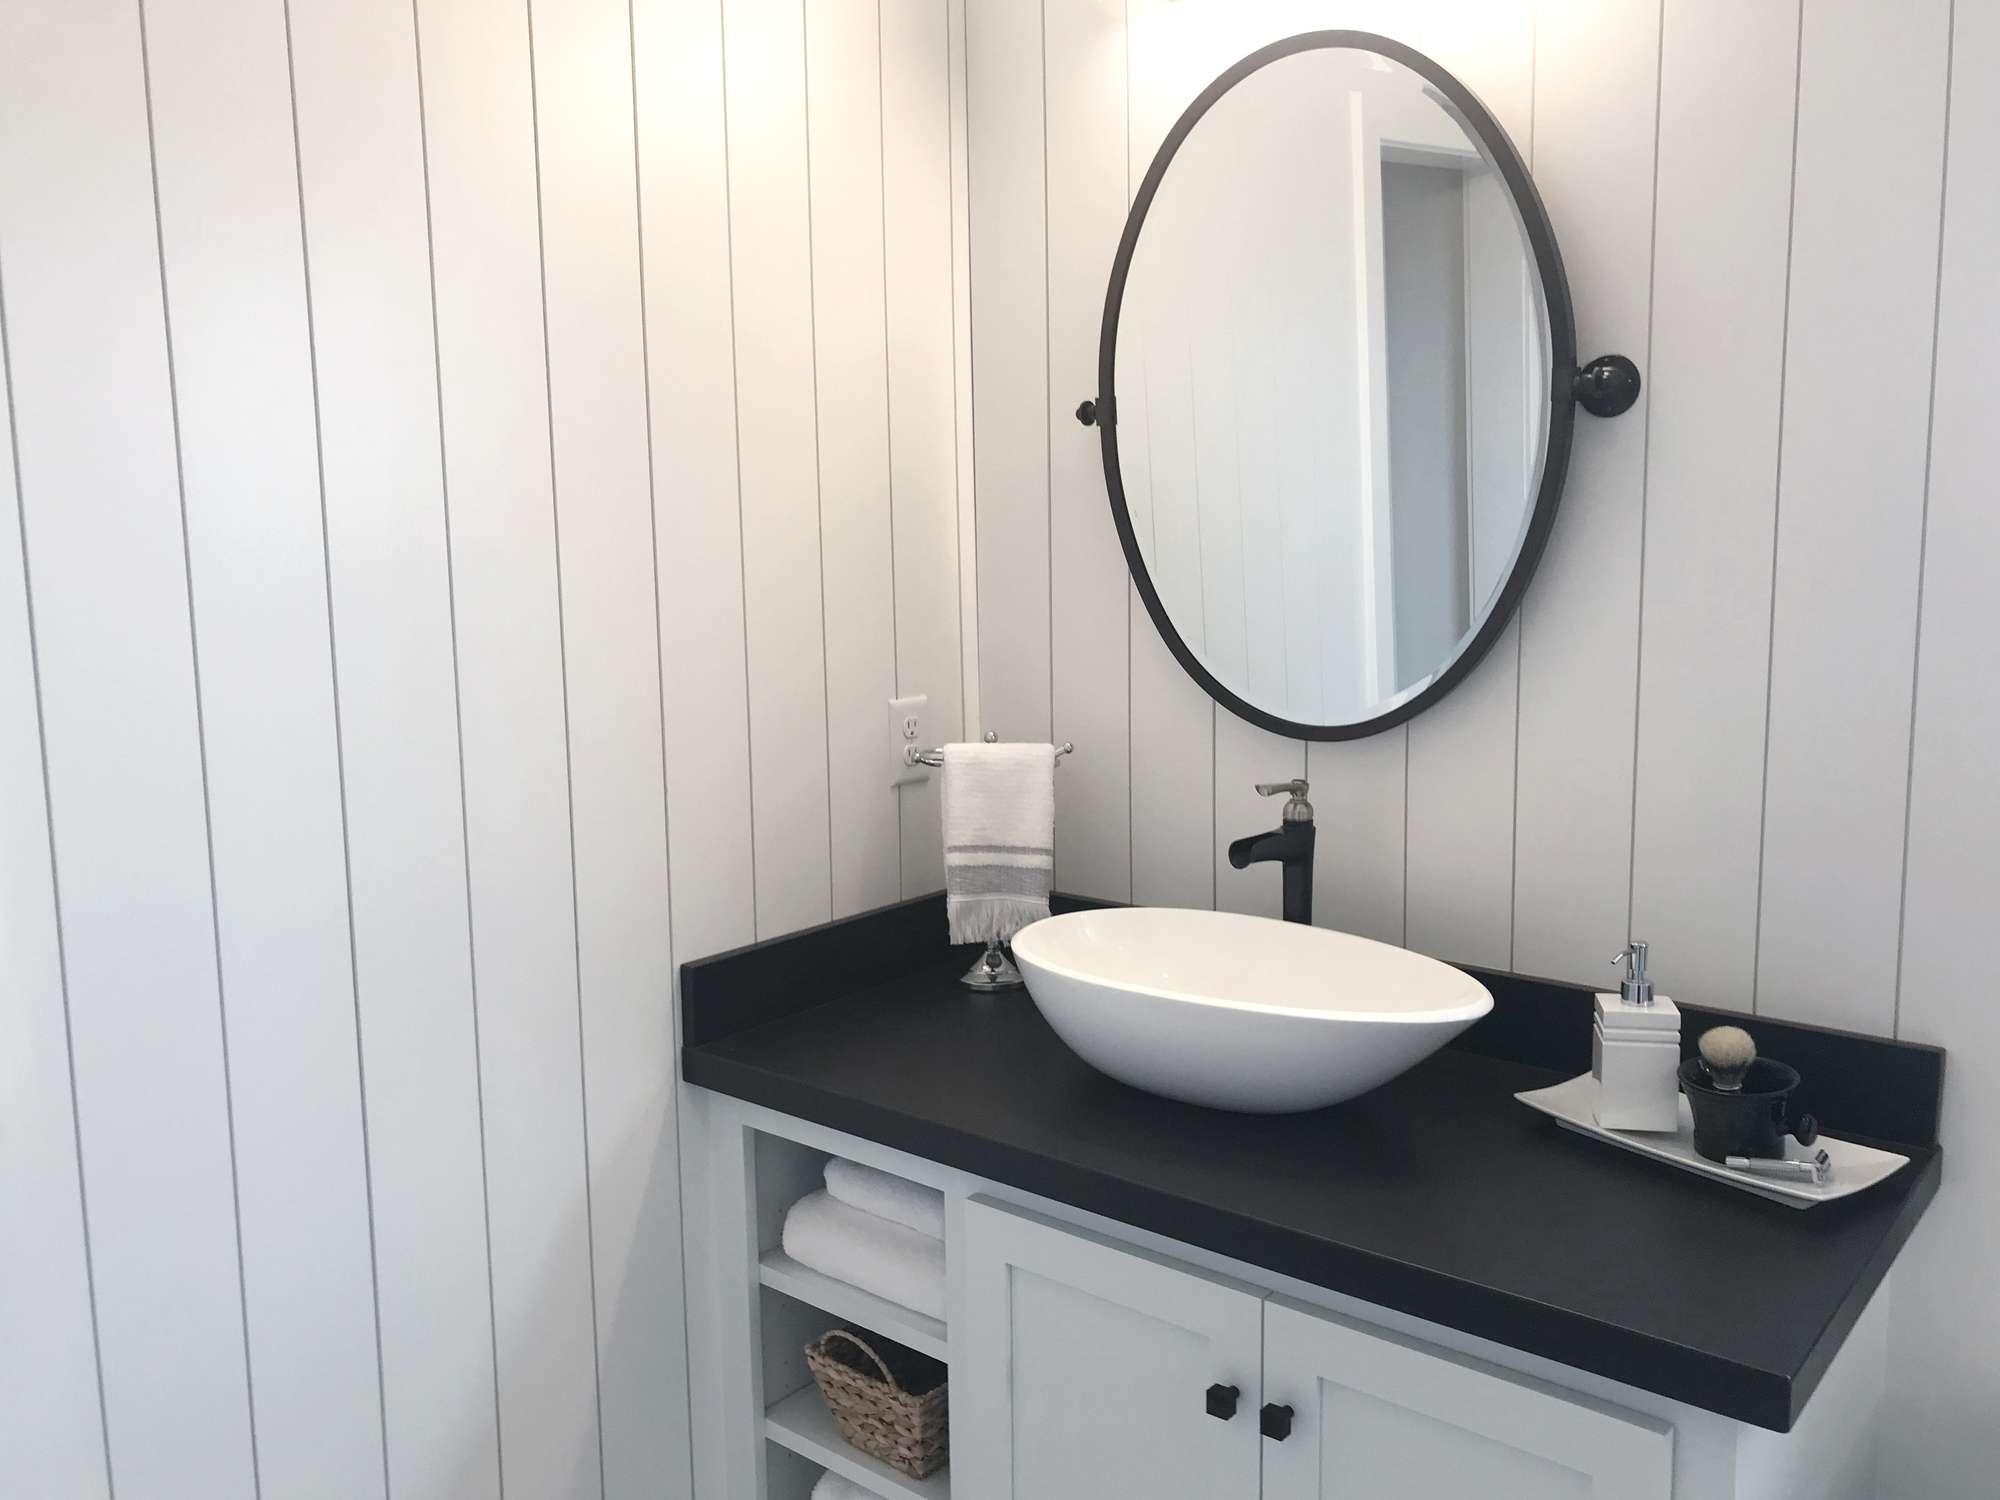 Vertical shiplap in a bathroom